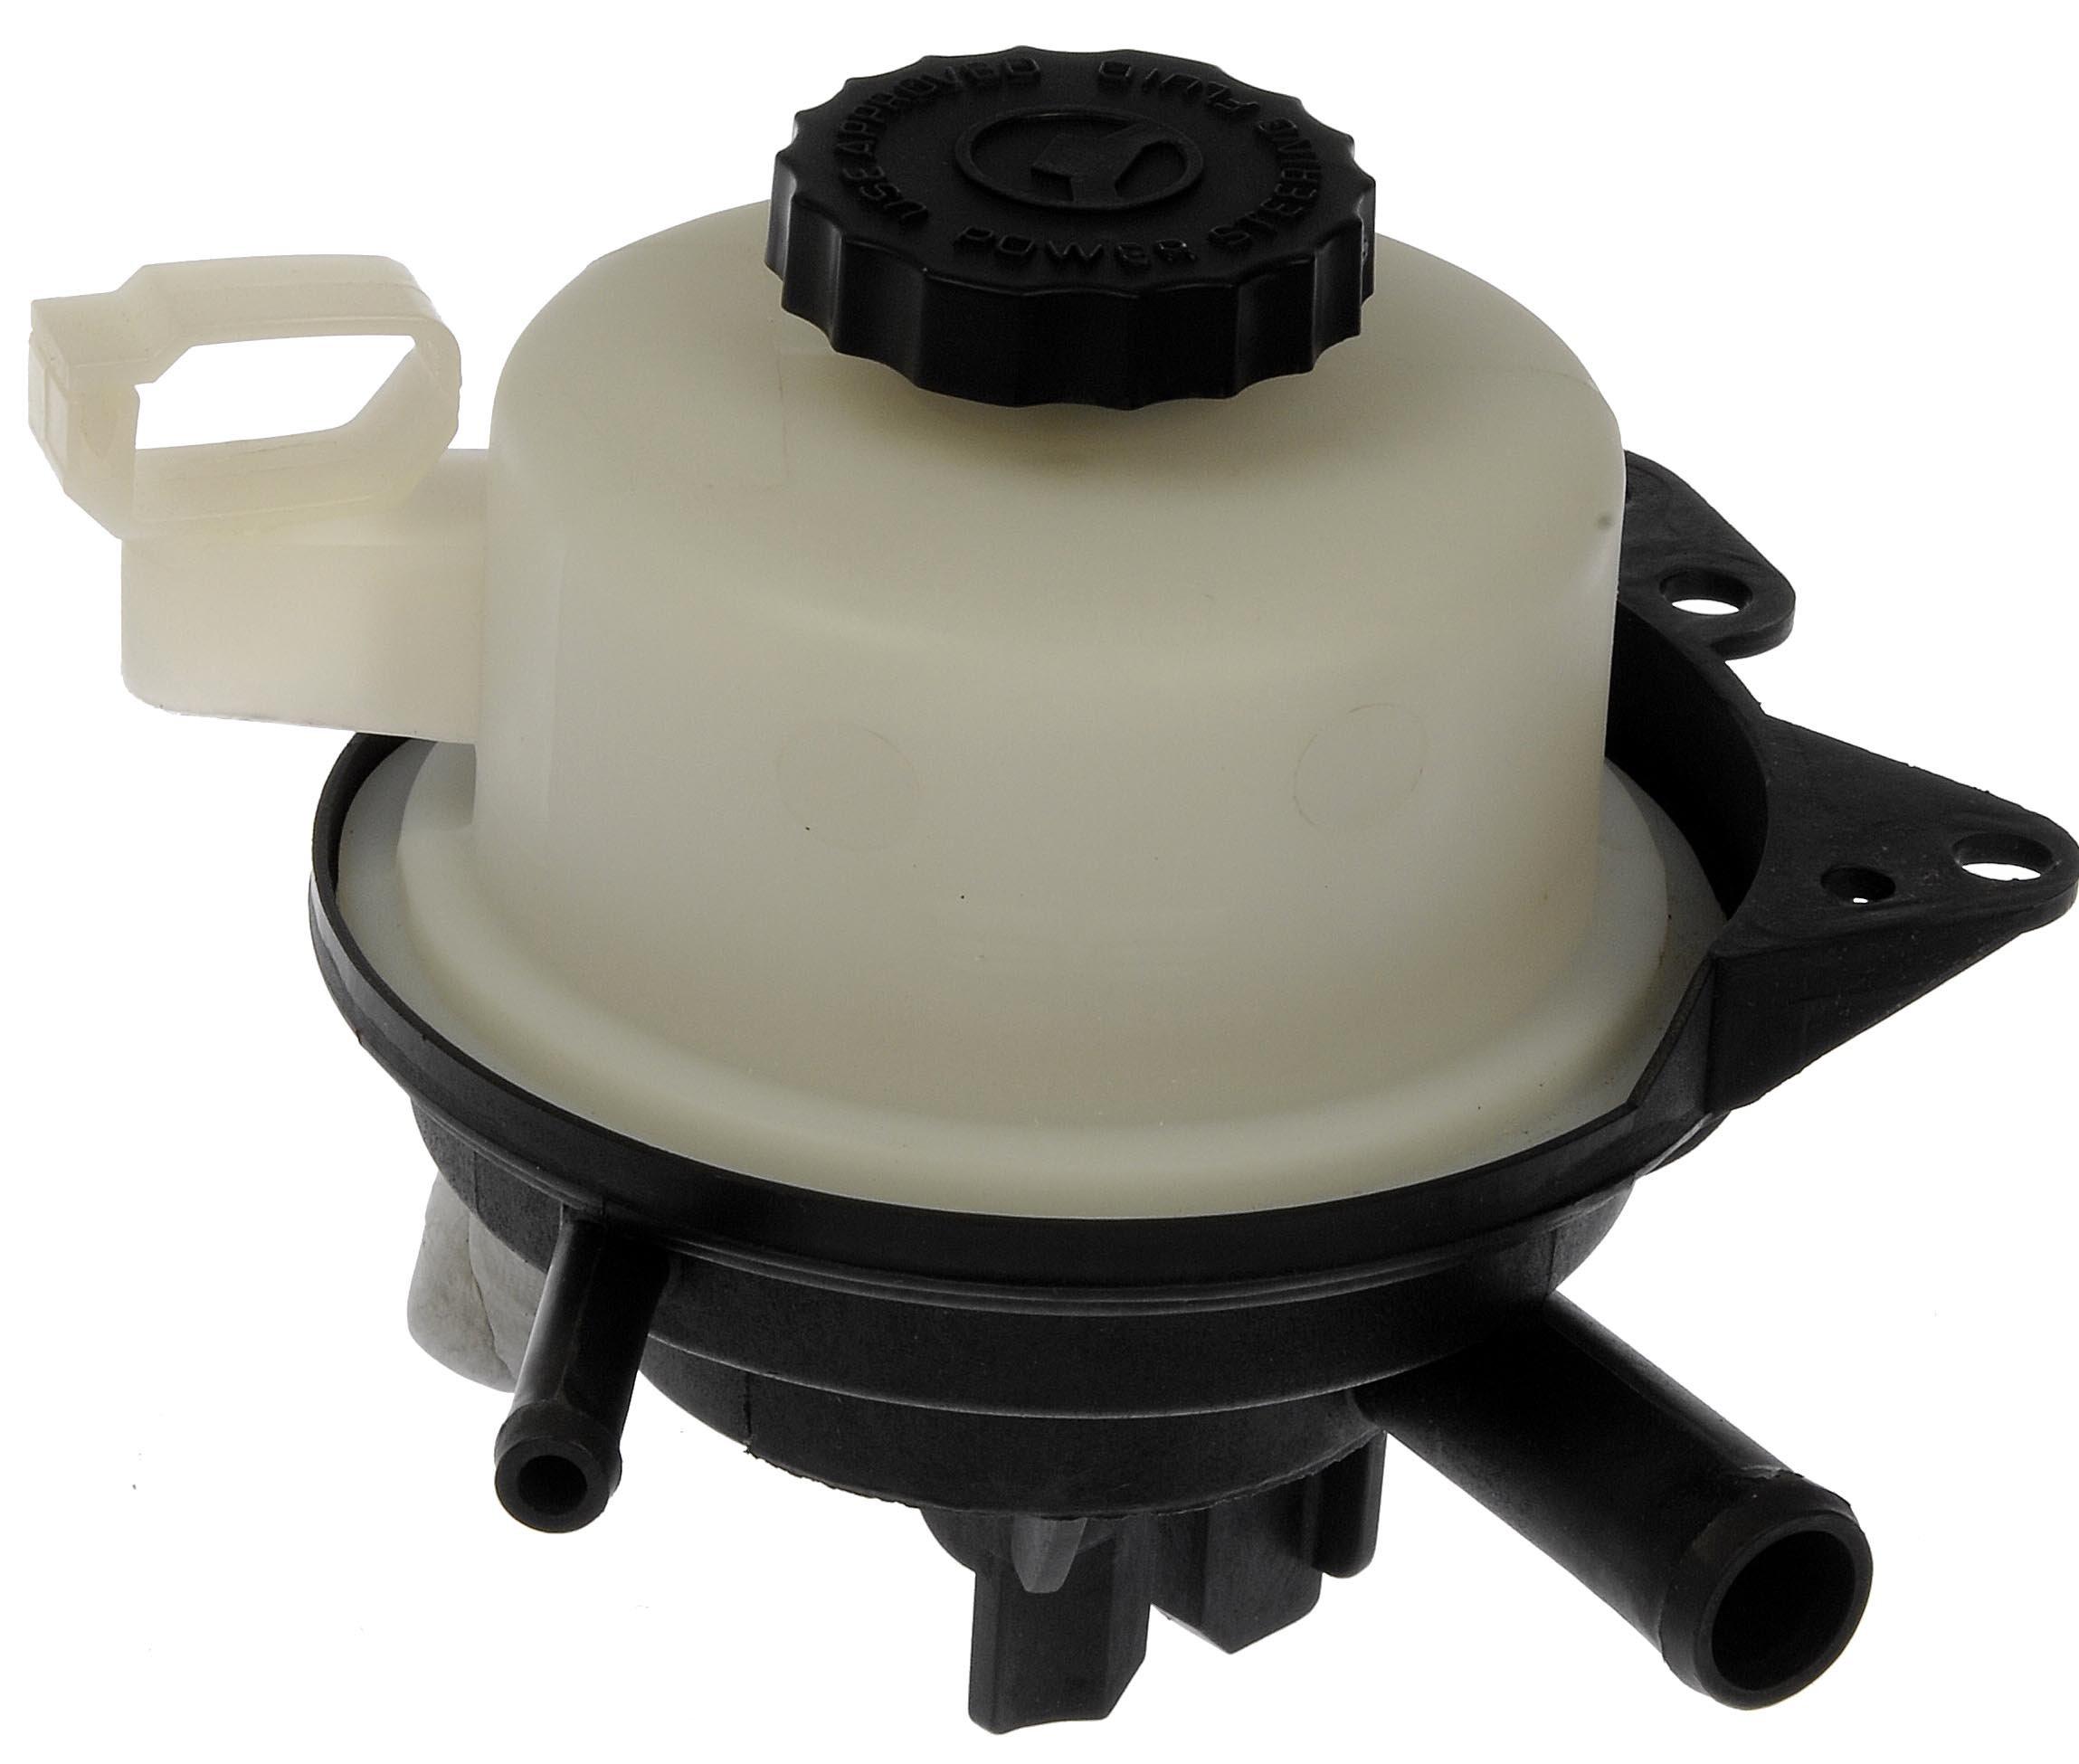 Dorman 603-934 Power Steering Reservoir product image